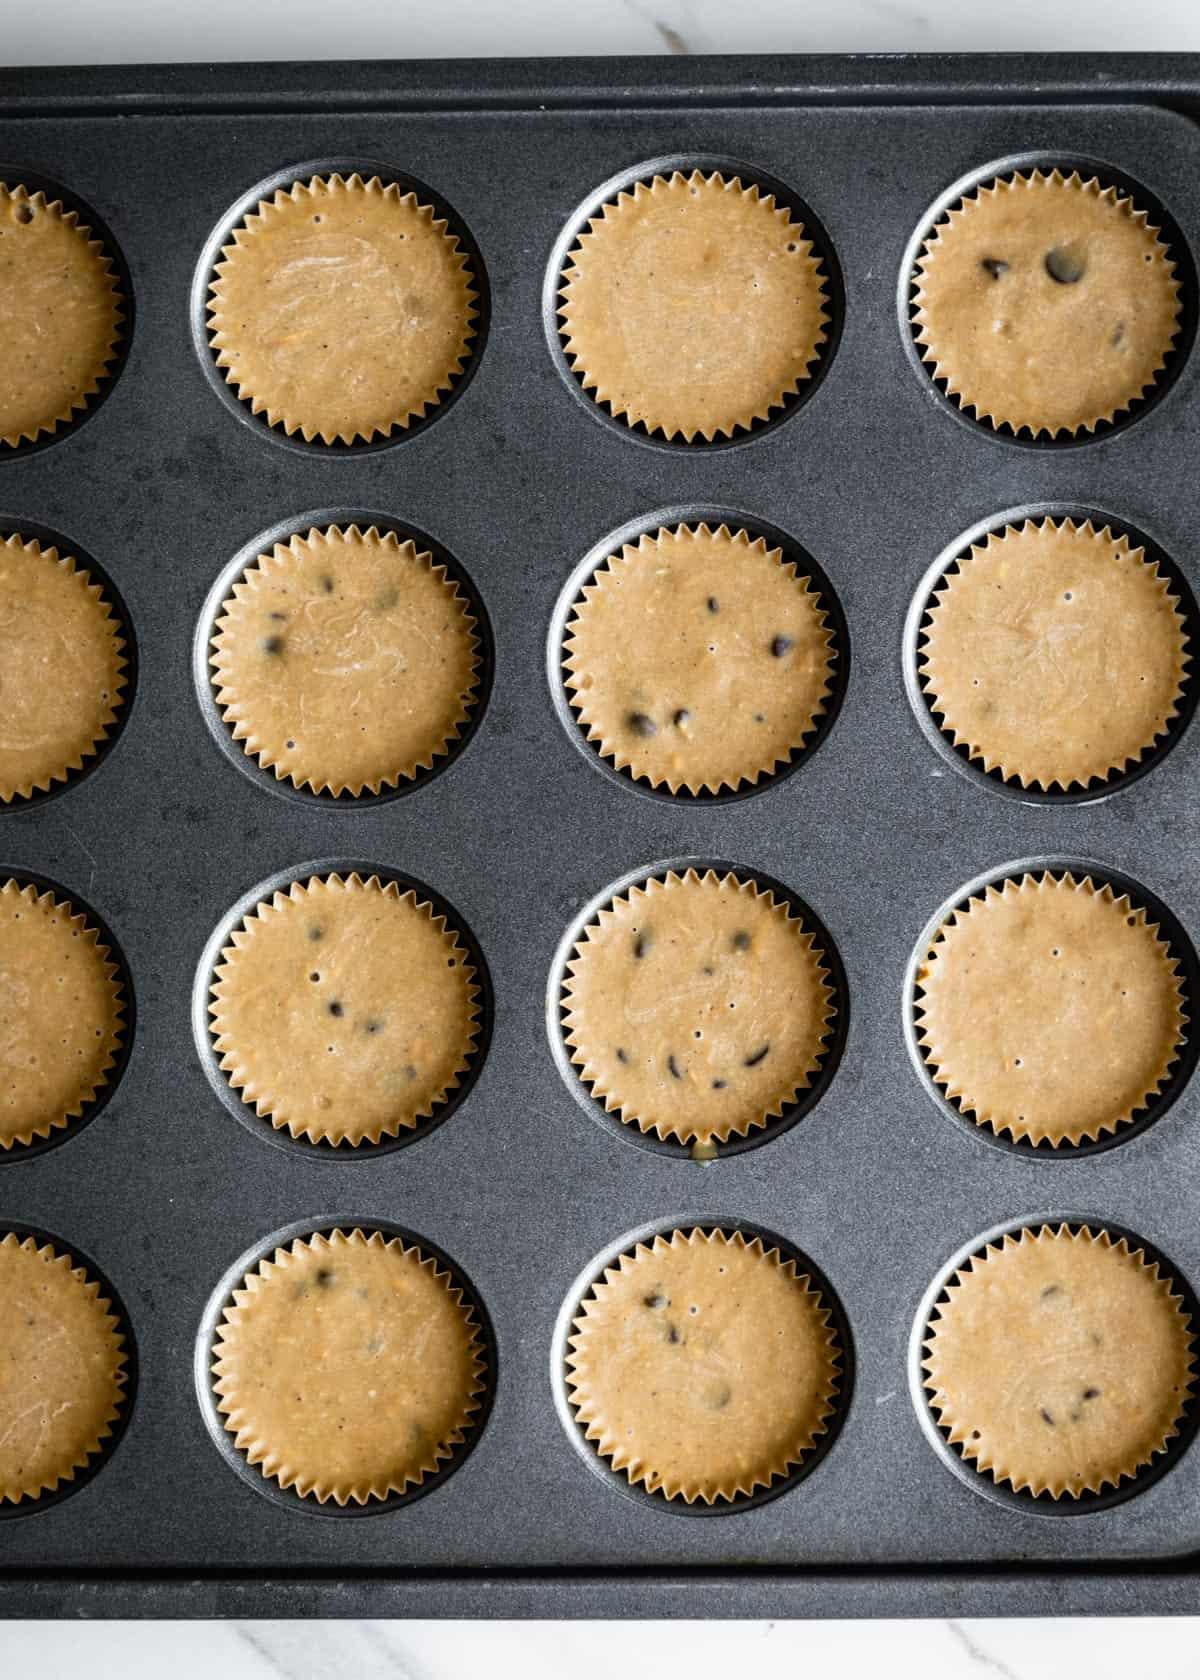 Nut-Free Chocolate Chip Keto Fat Bombs